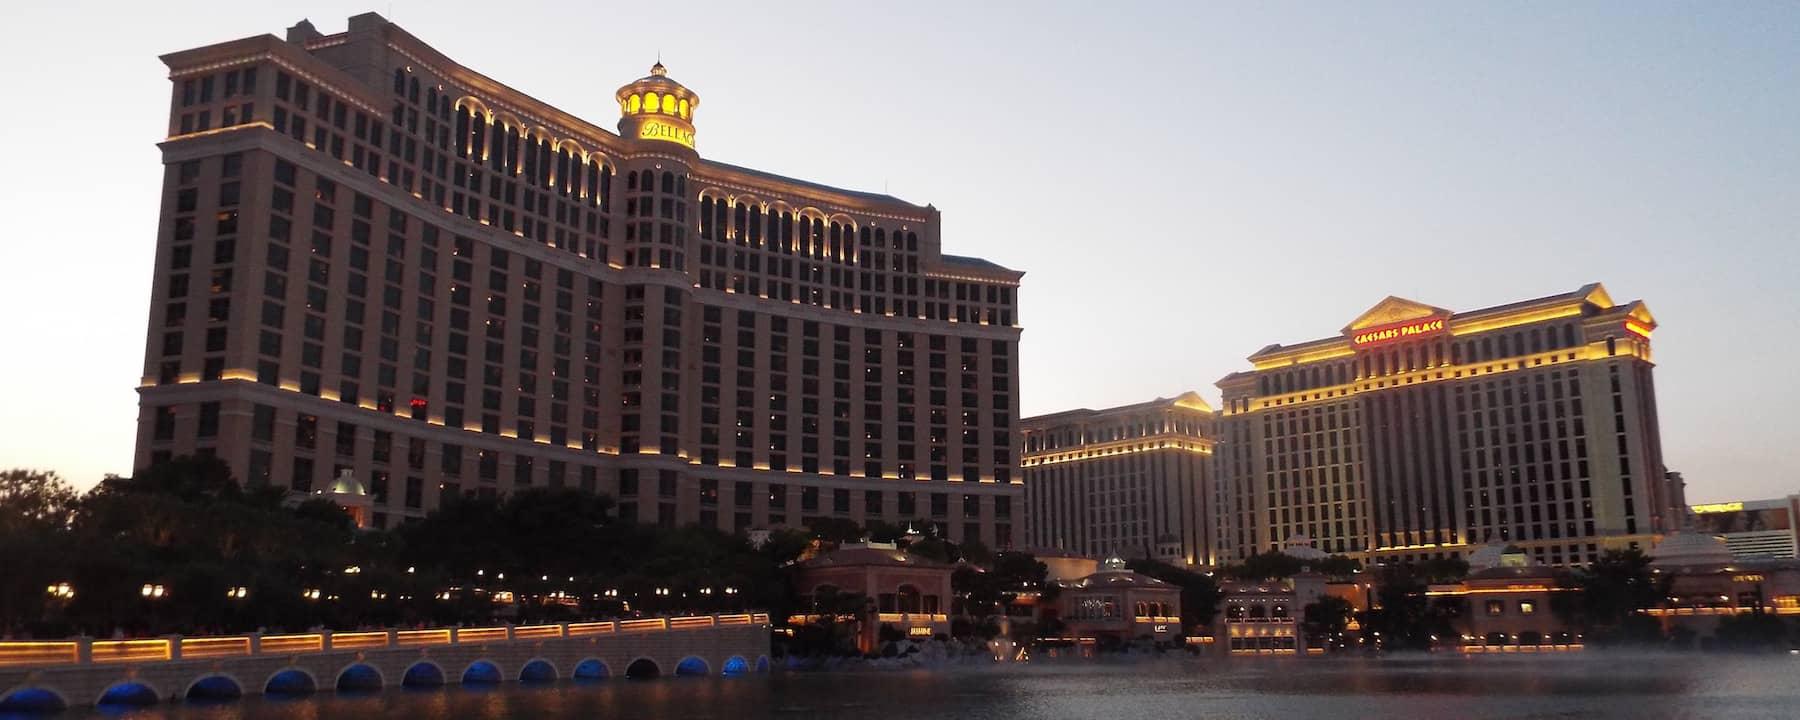 Viva Las Vegas a day on the strip